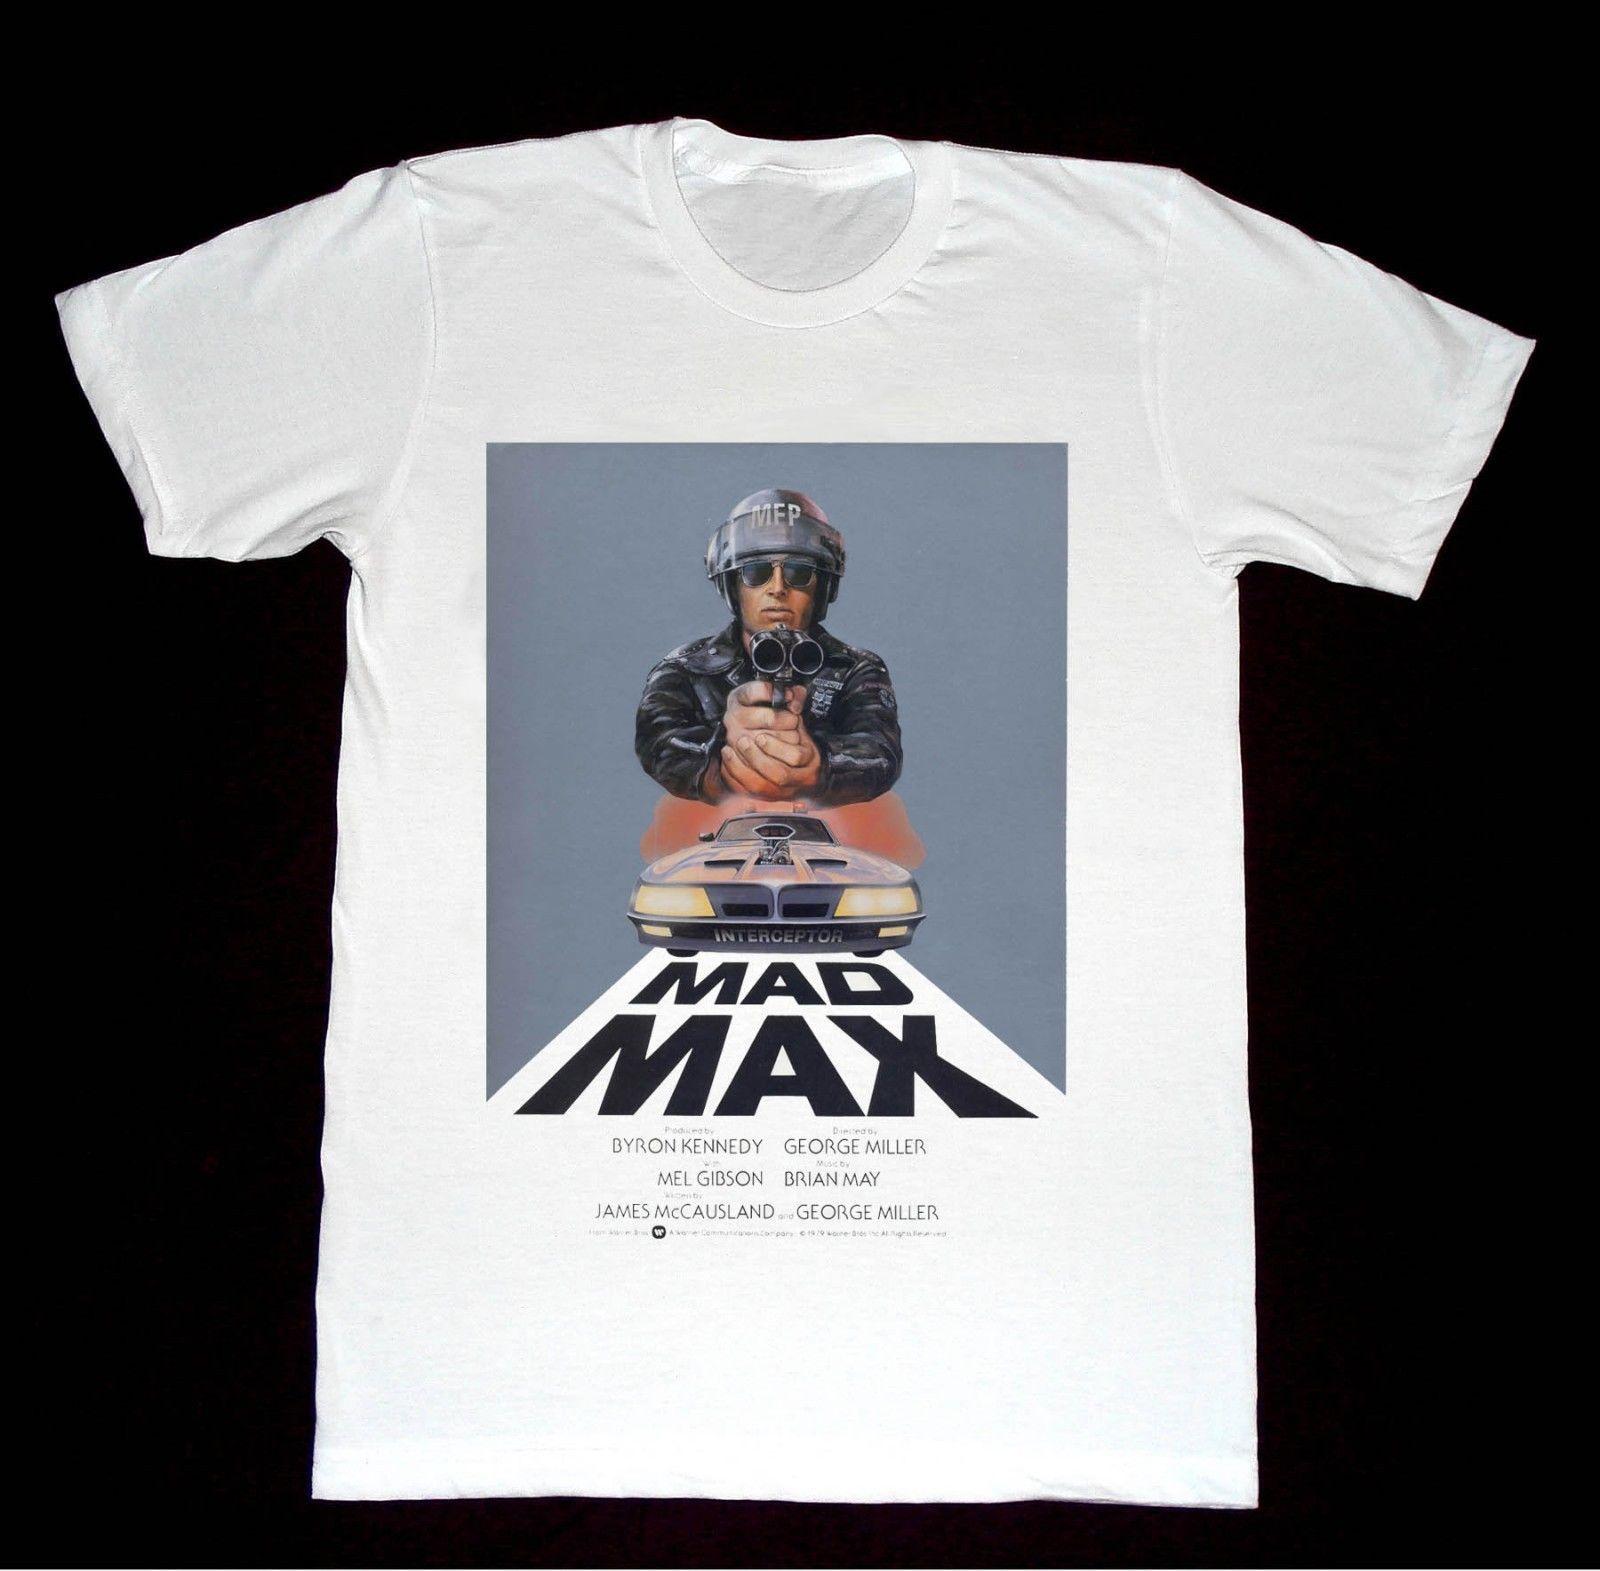 Fit 80's Adulto Max Xxxl Original Para Película Camisas Camiseta Aussie Mad Cult Hombres Slim S LSGzqUMVp